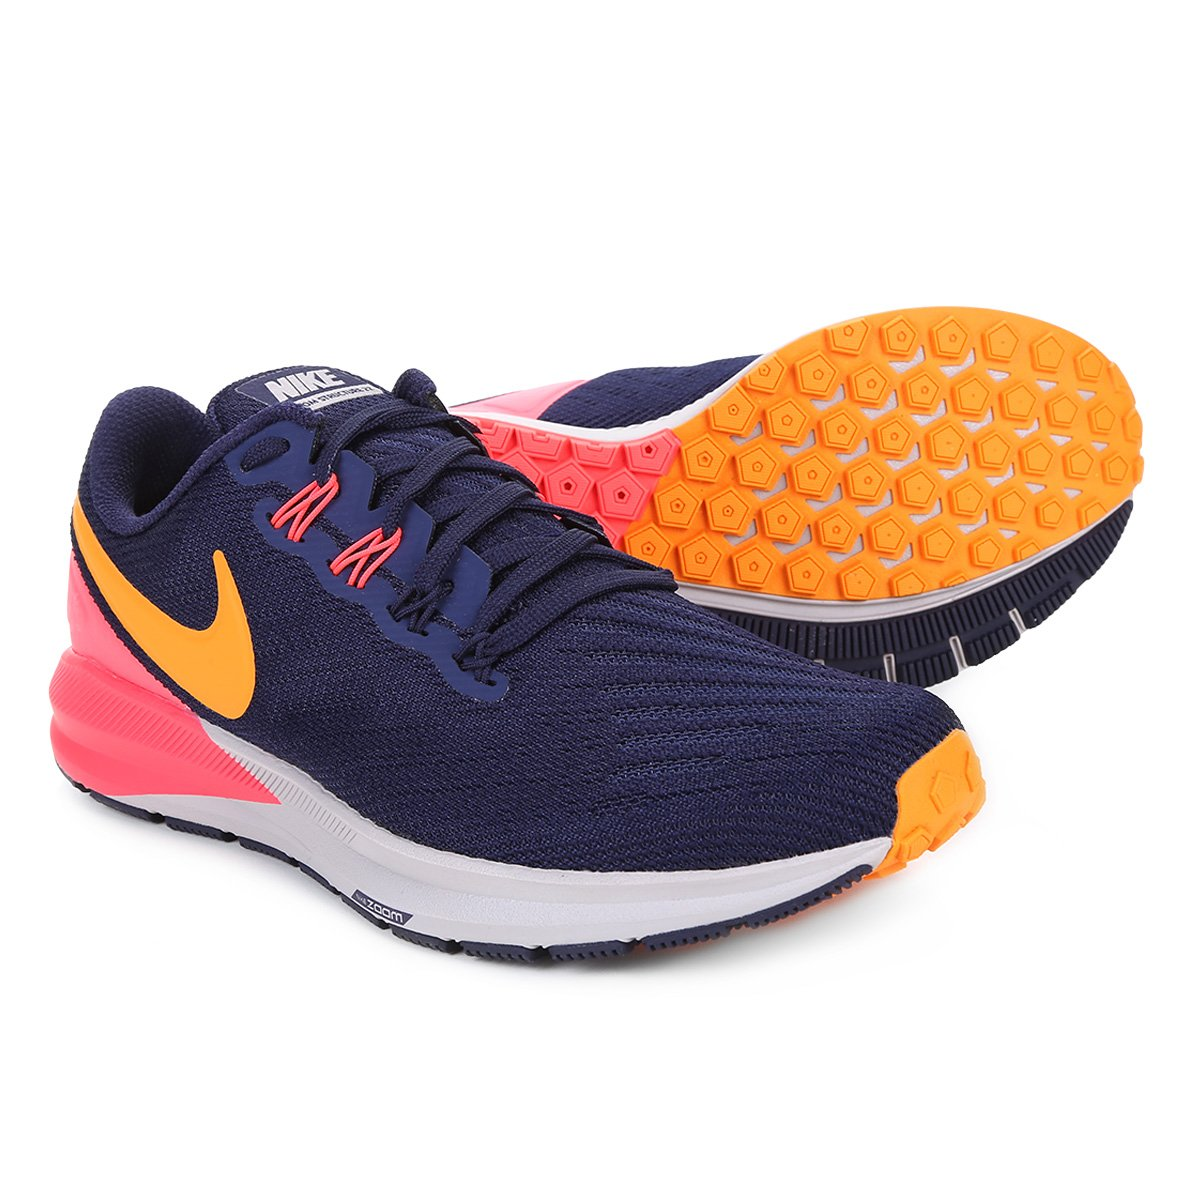 Tênis Nike Air Zoom Structure 22 Feminino Azul E Rosa